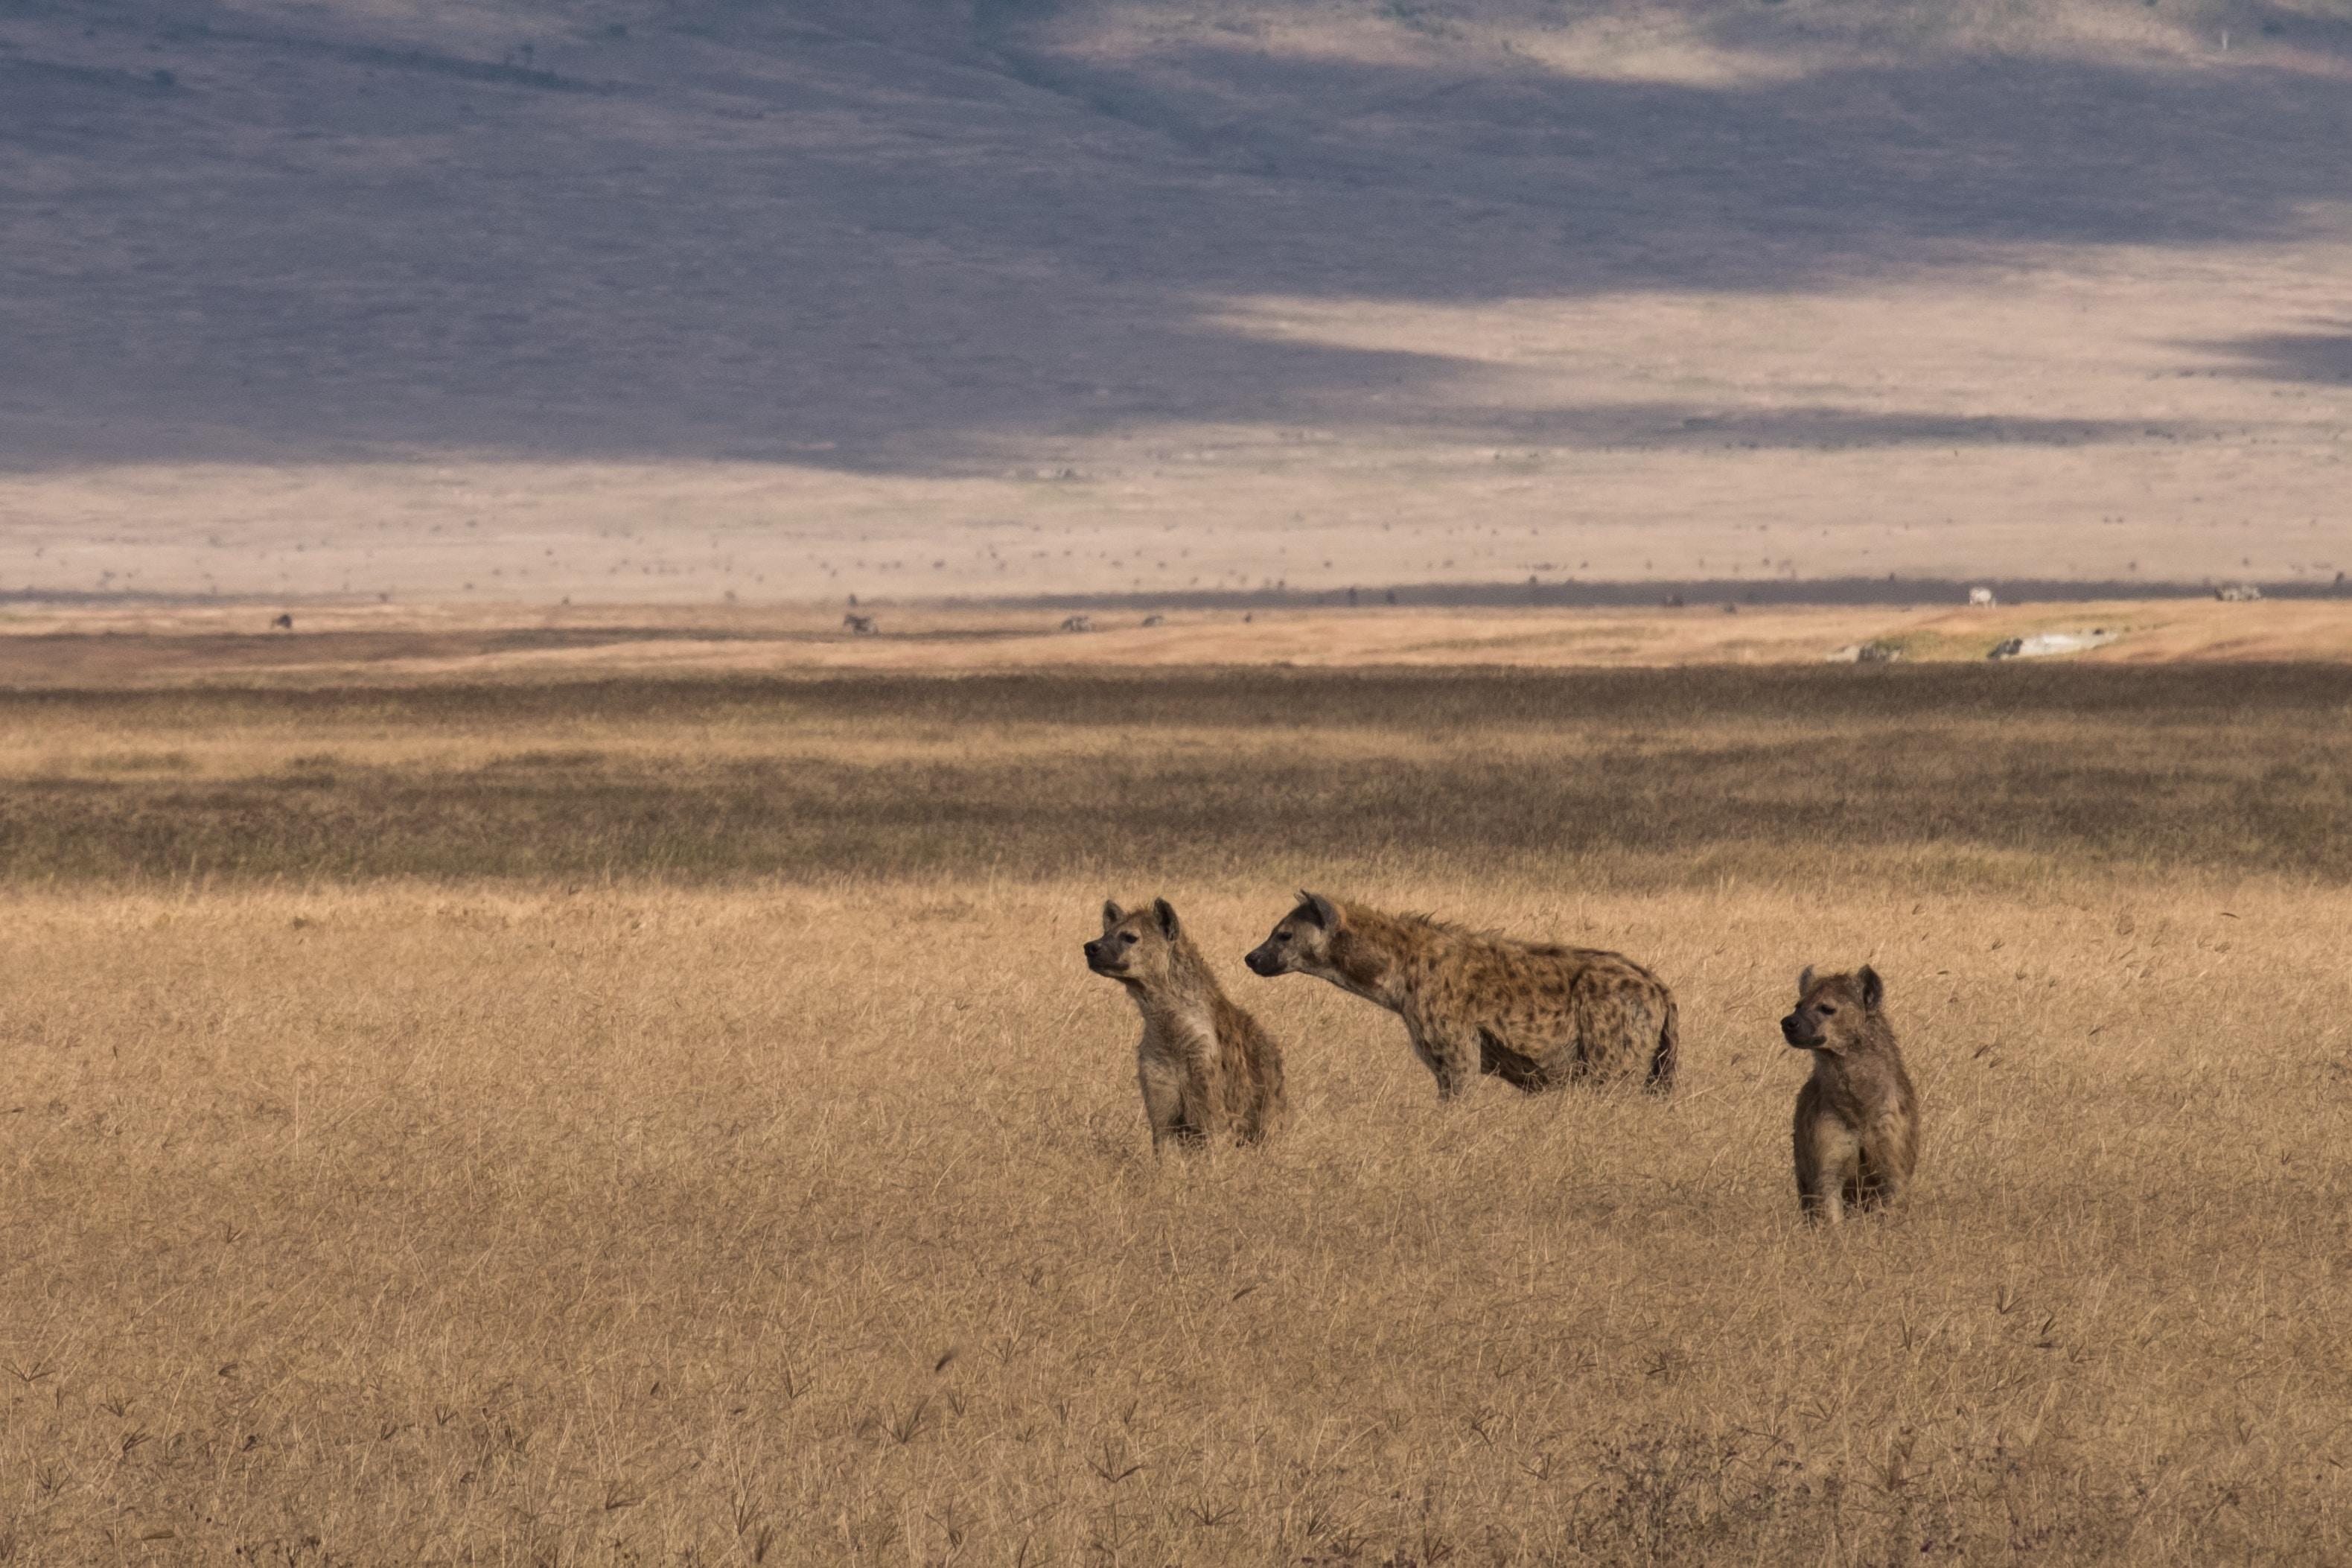 Hyenas watch their prey in a field in Tanzania